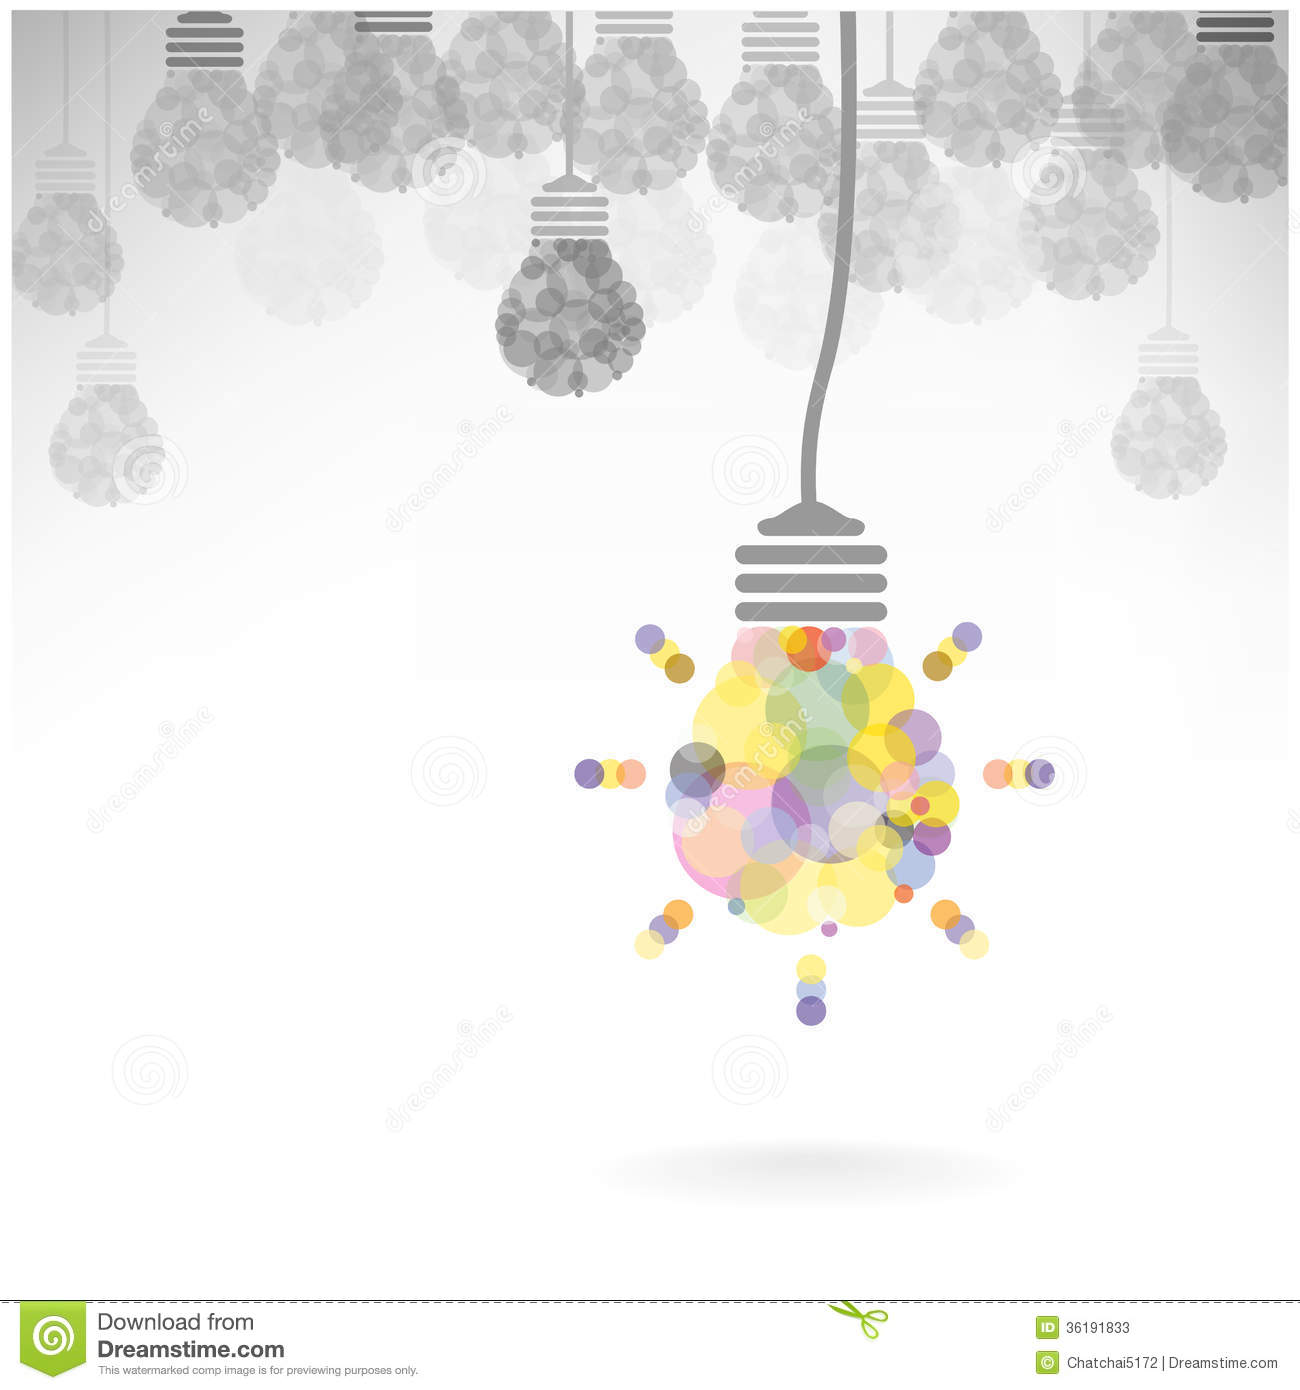 Wallpaper Teknologi 3d 16 Light Bulb Design Images Light Bulb Embroidery Design